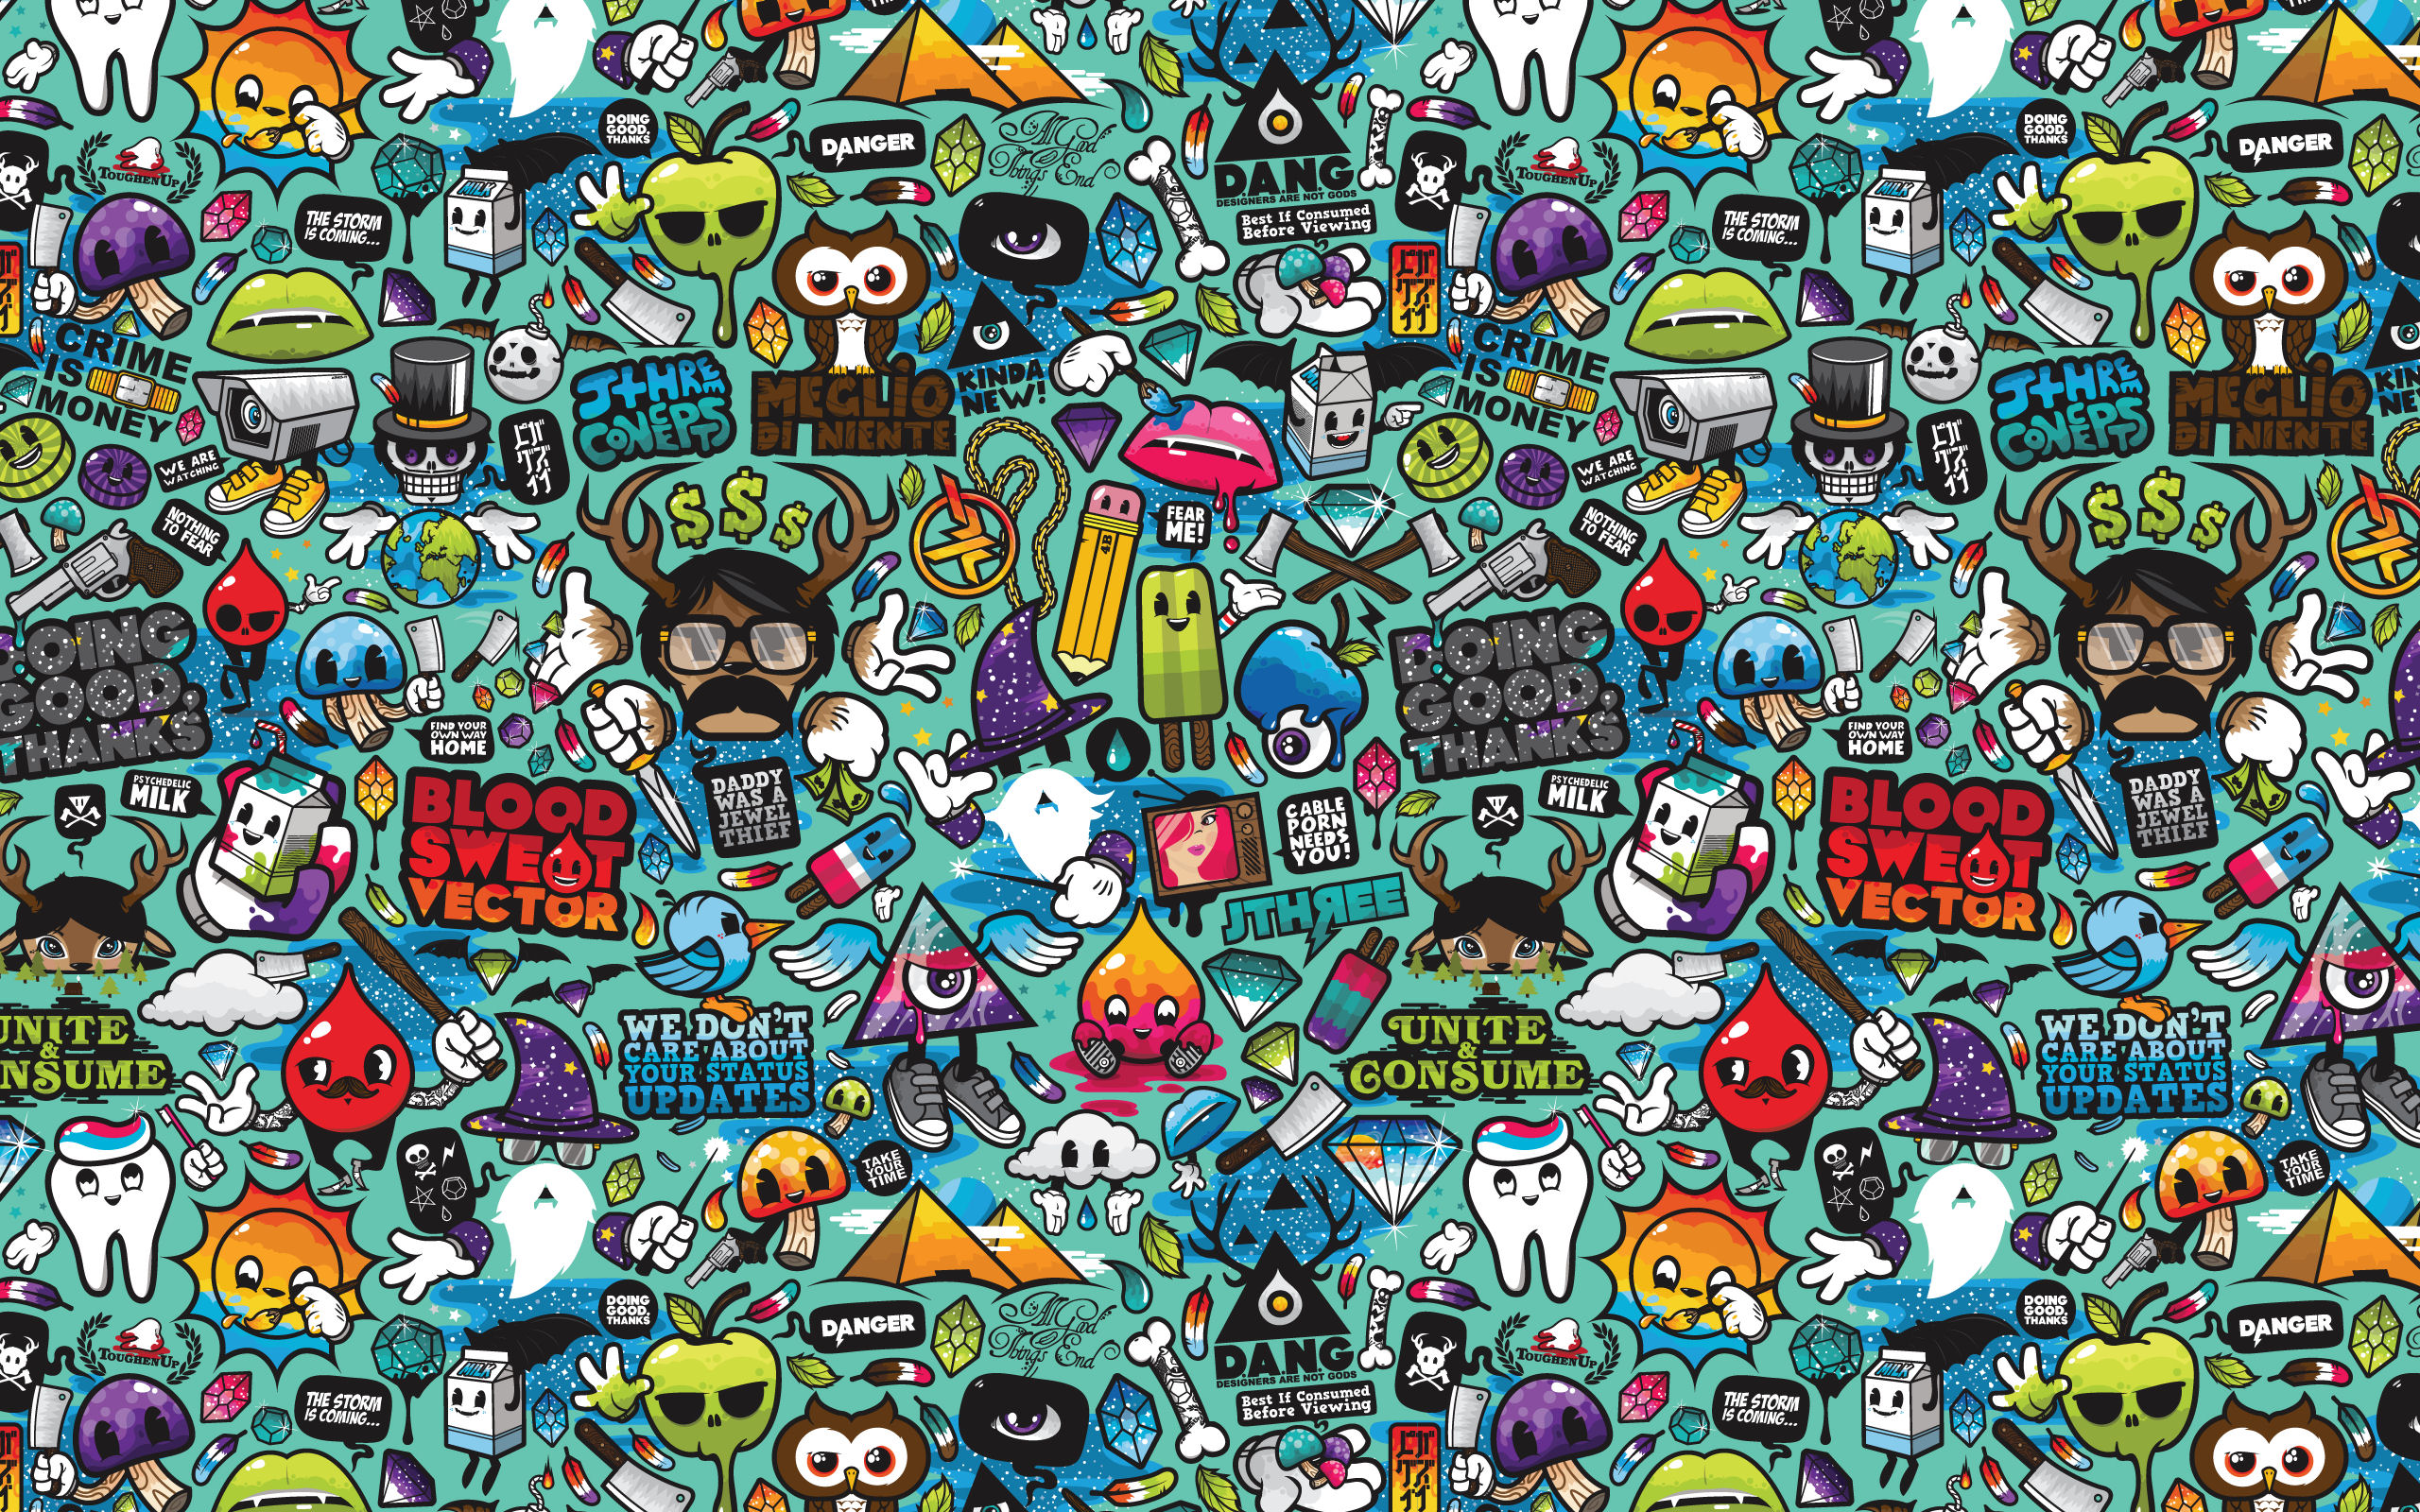 Retro Robot Wallpaper Backgrounds 2560x1600